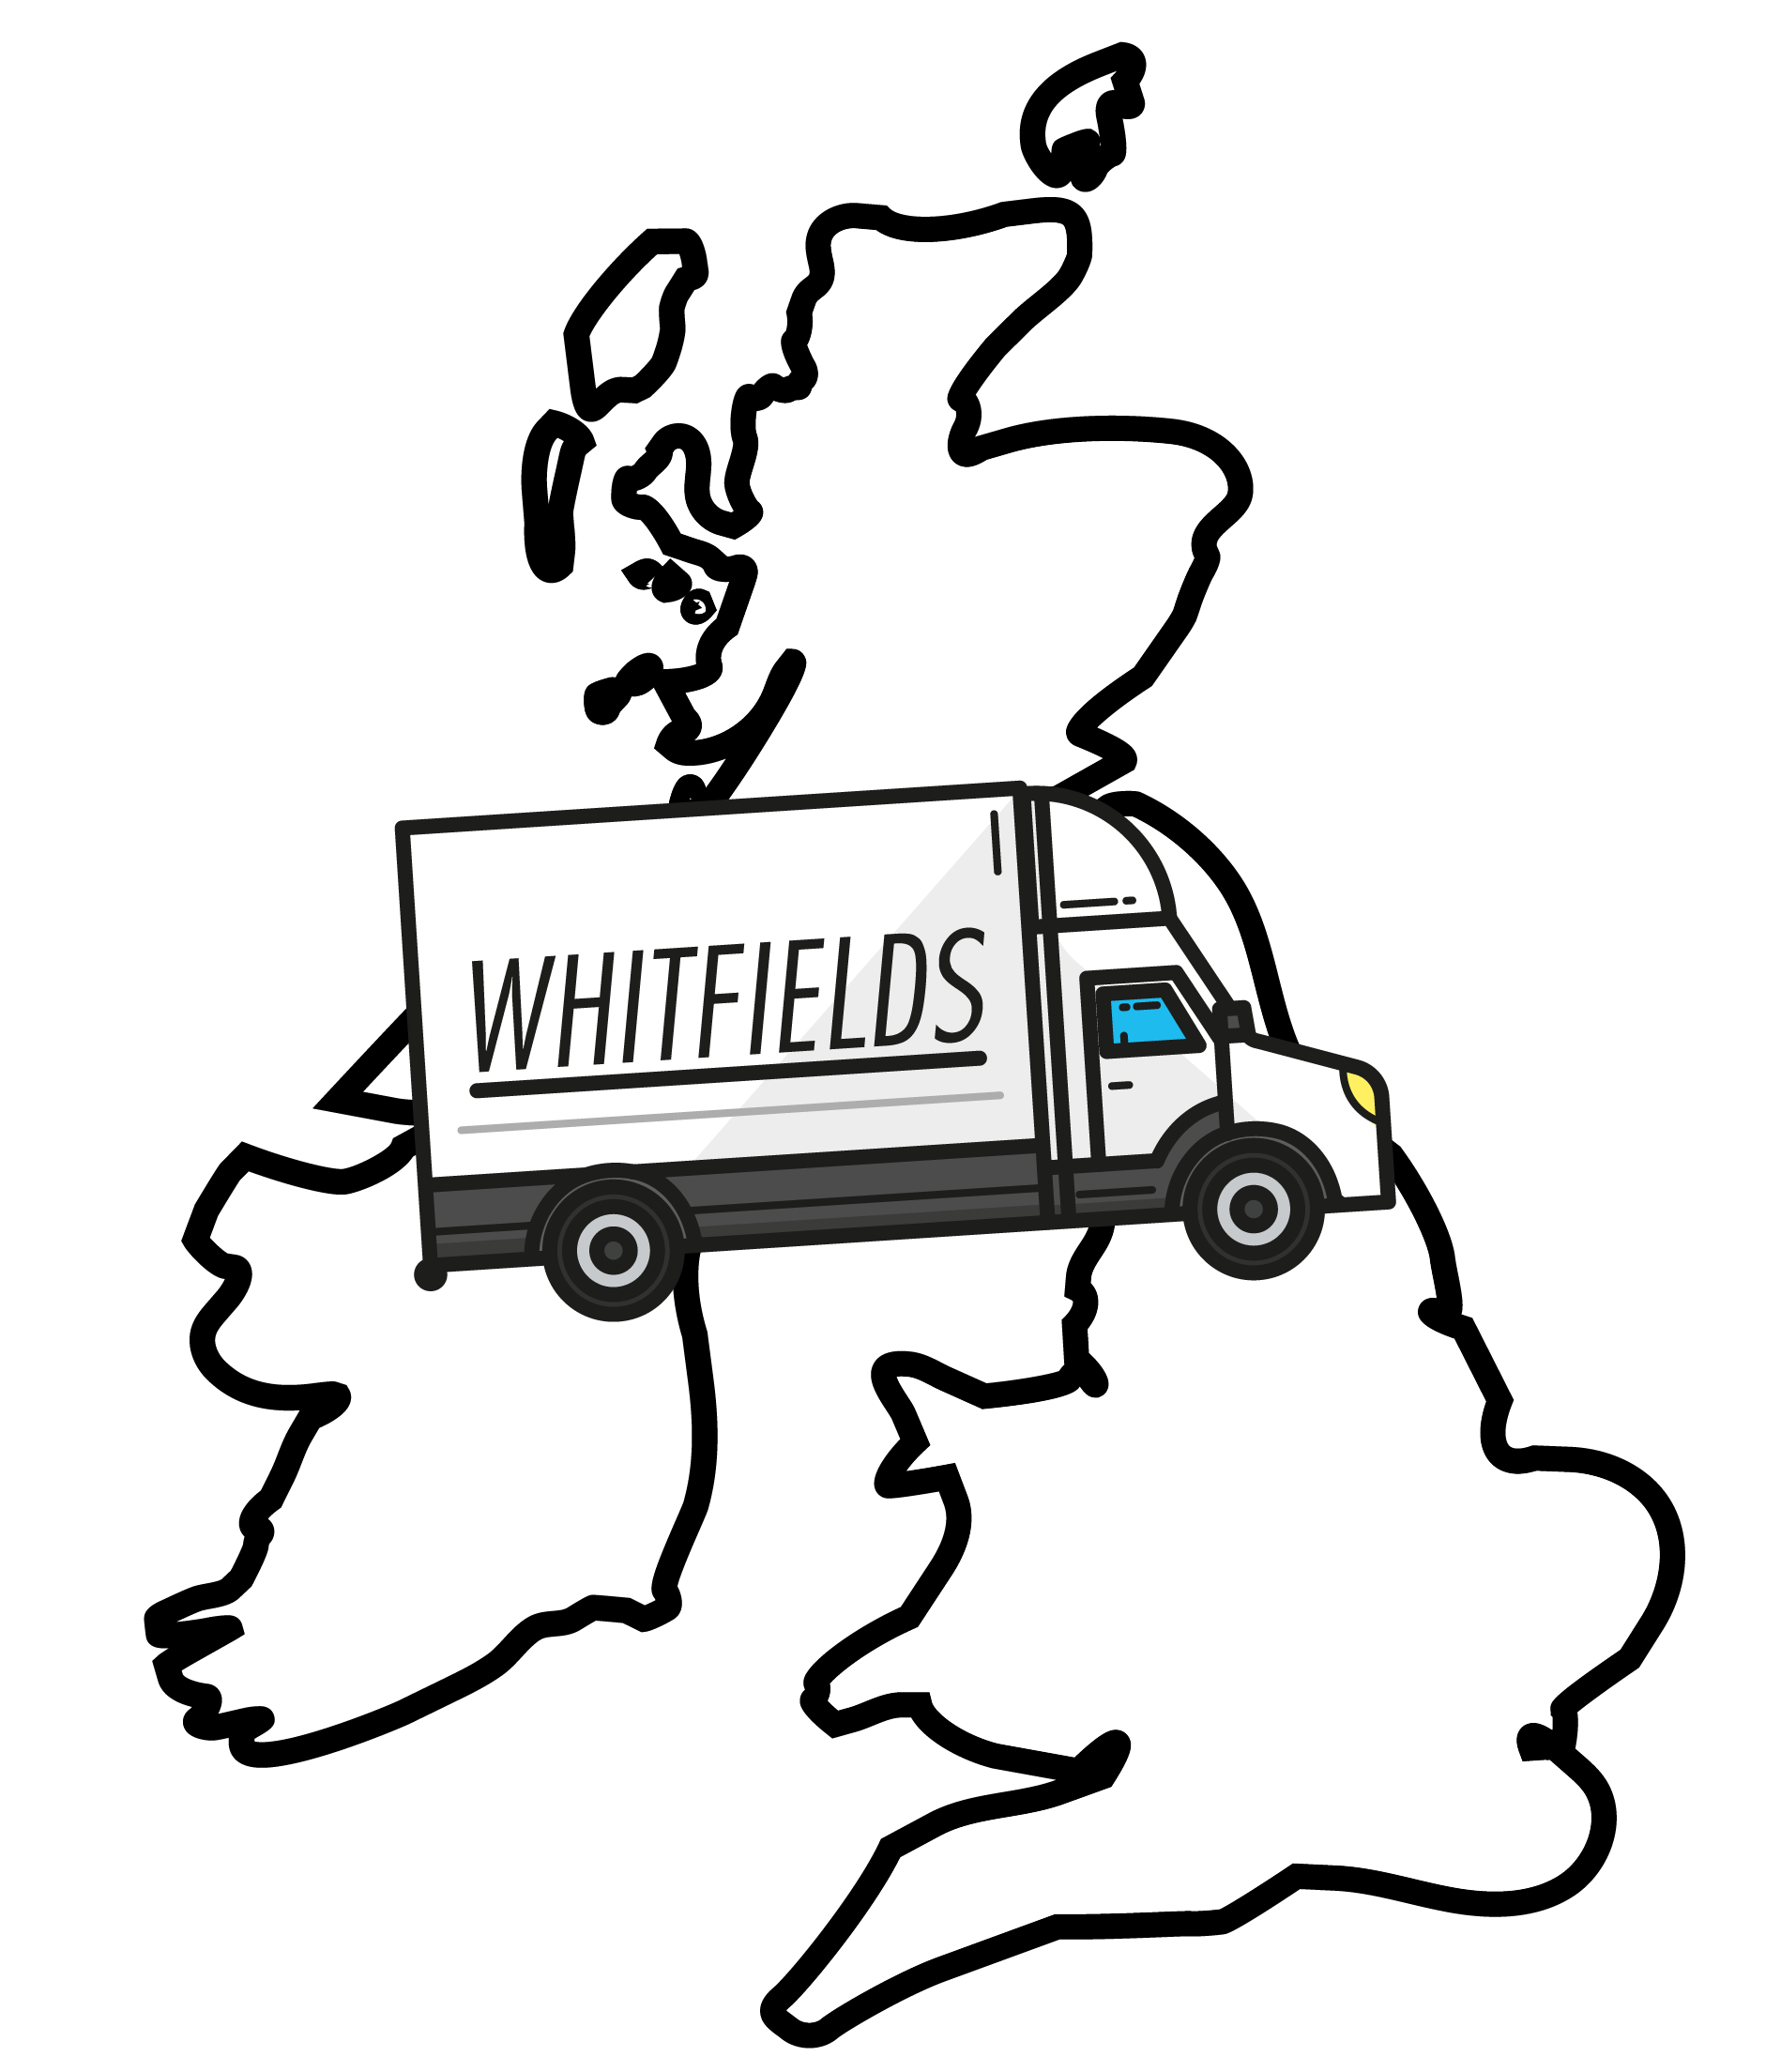 Illustration of the UK